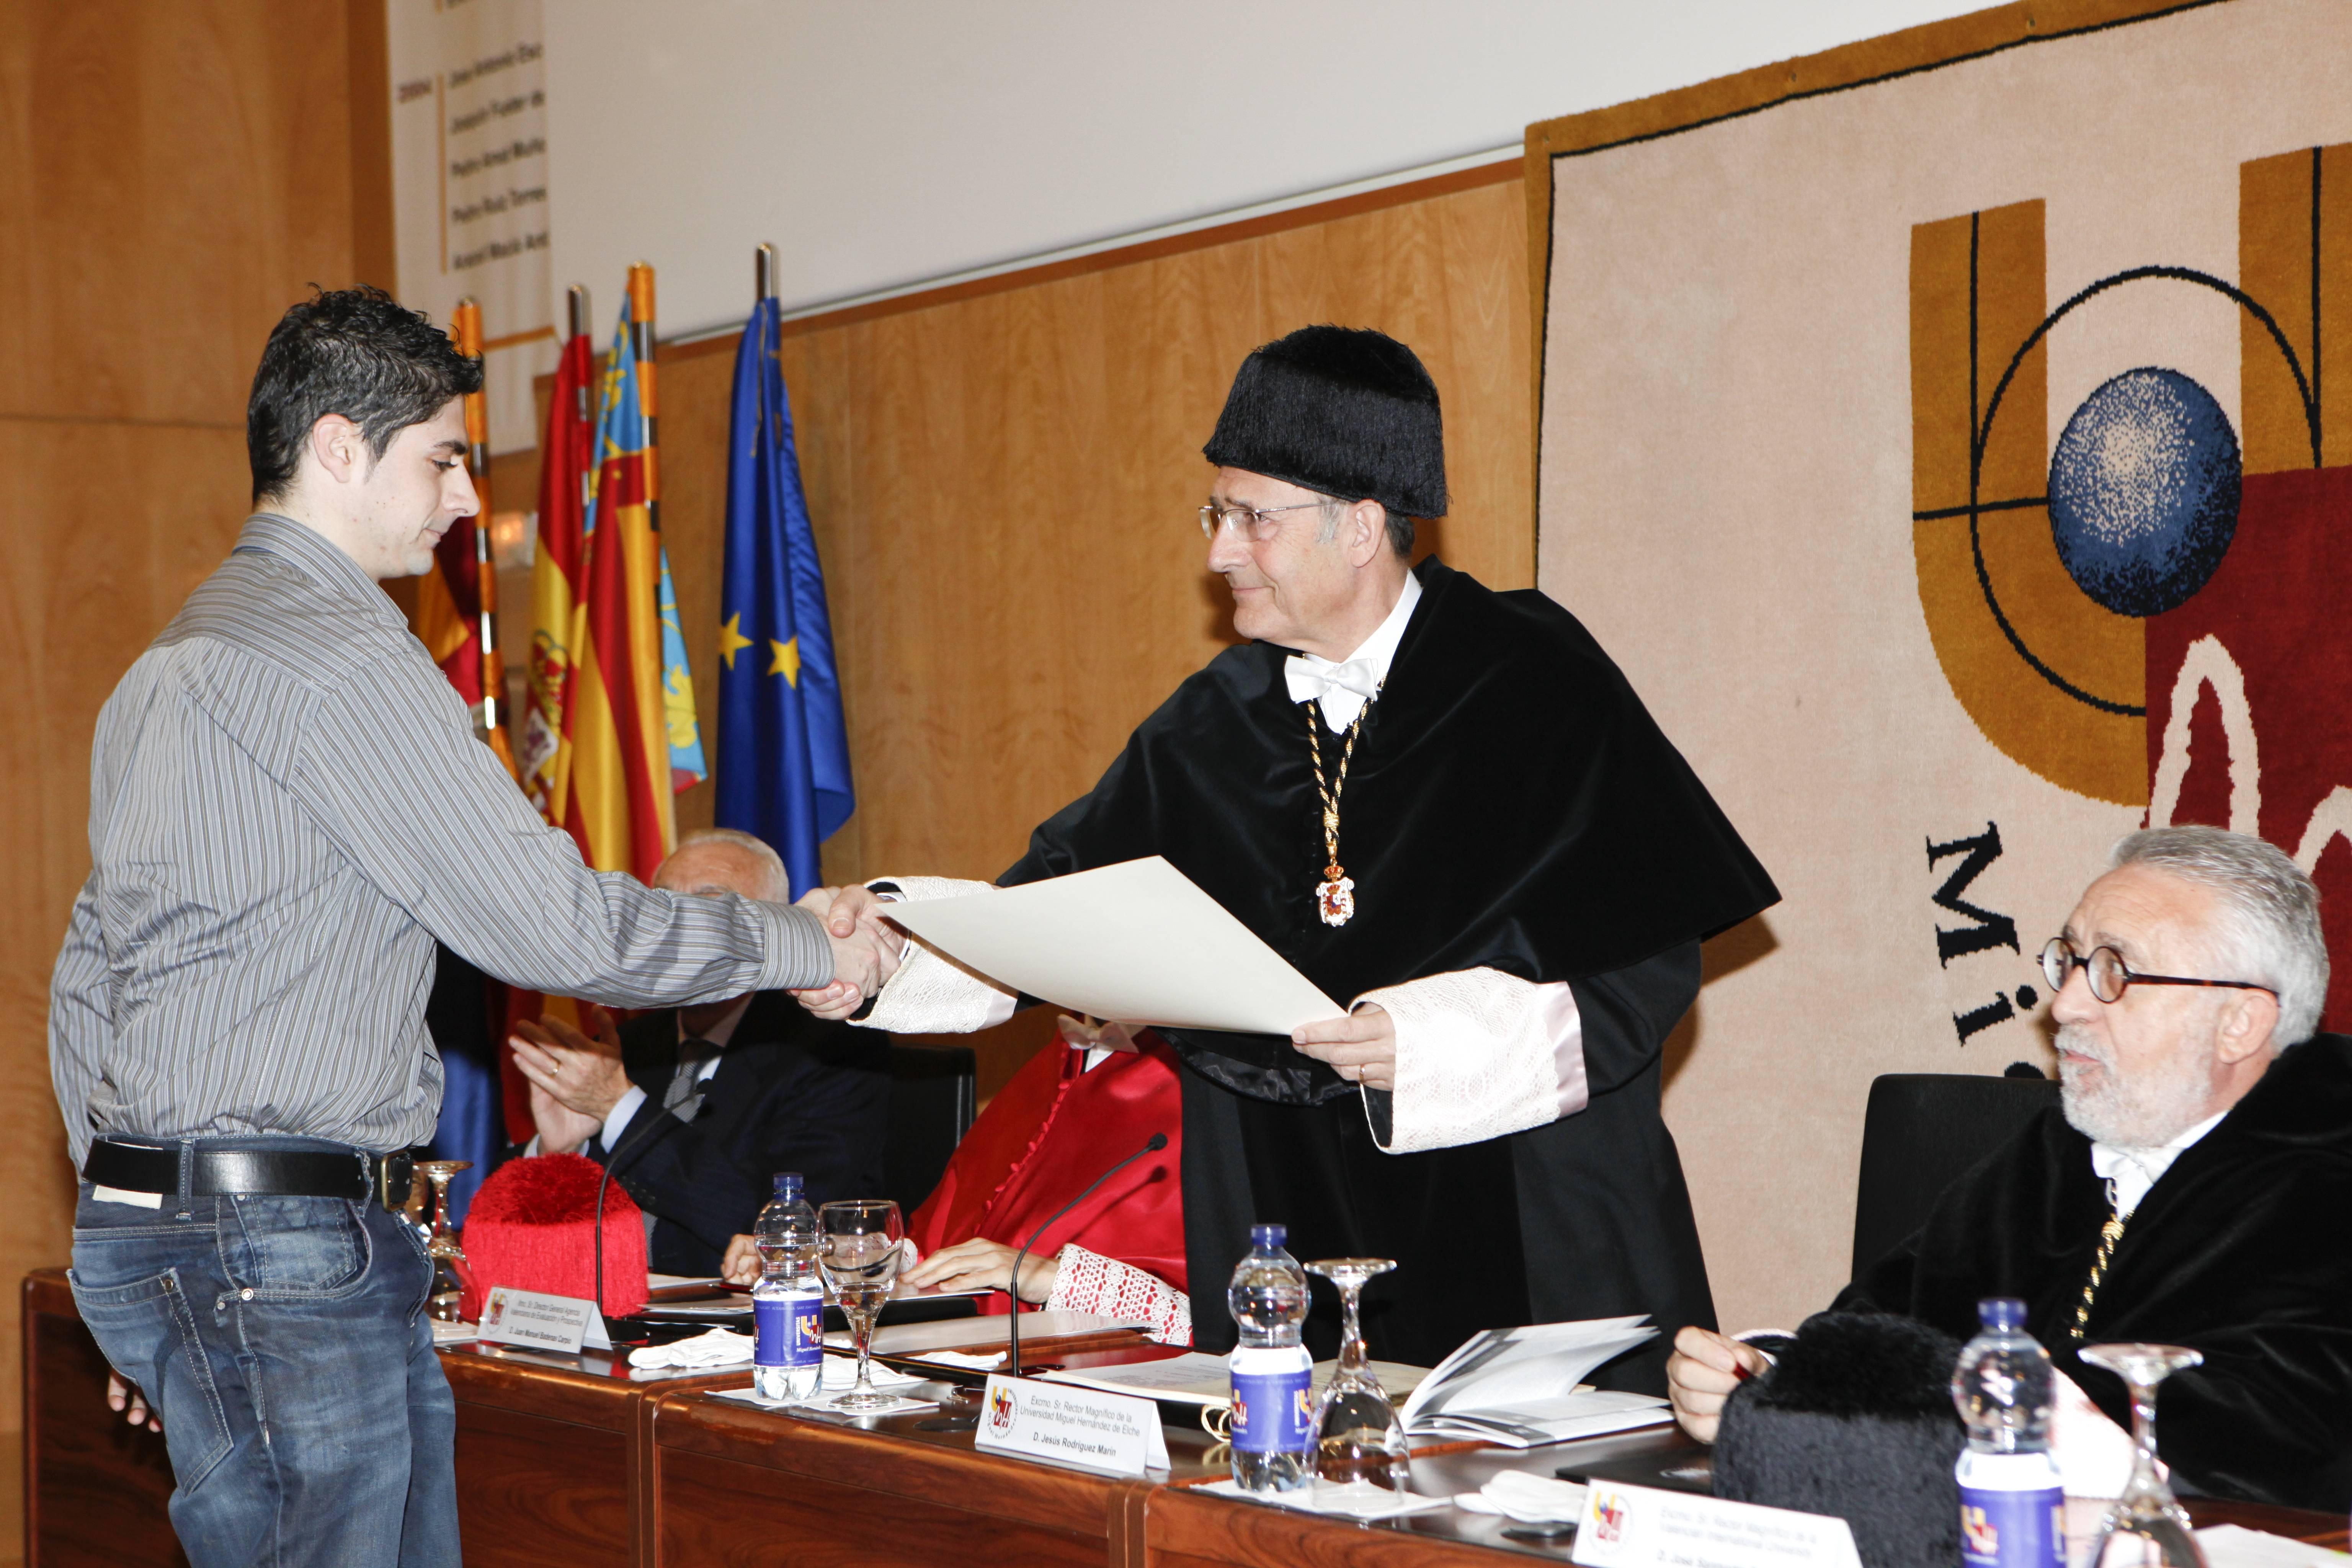 doctor-honoris-causa-luis-gamir_mg_0891.jpg